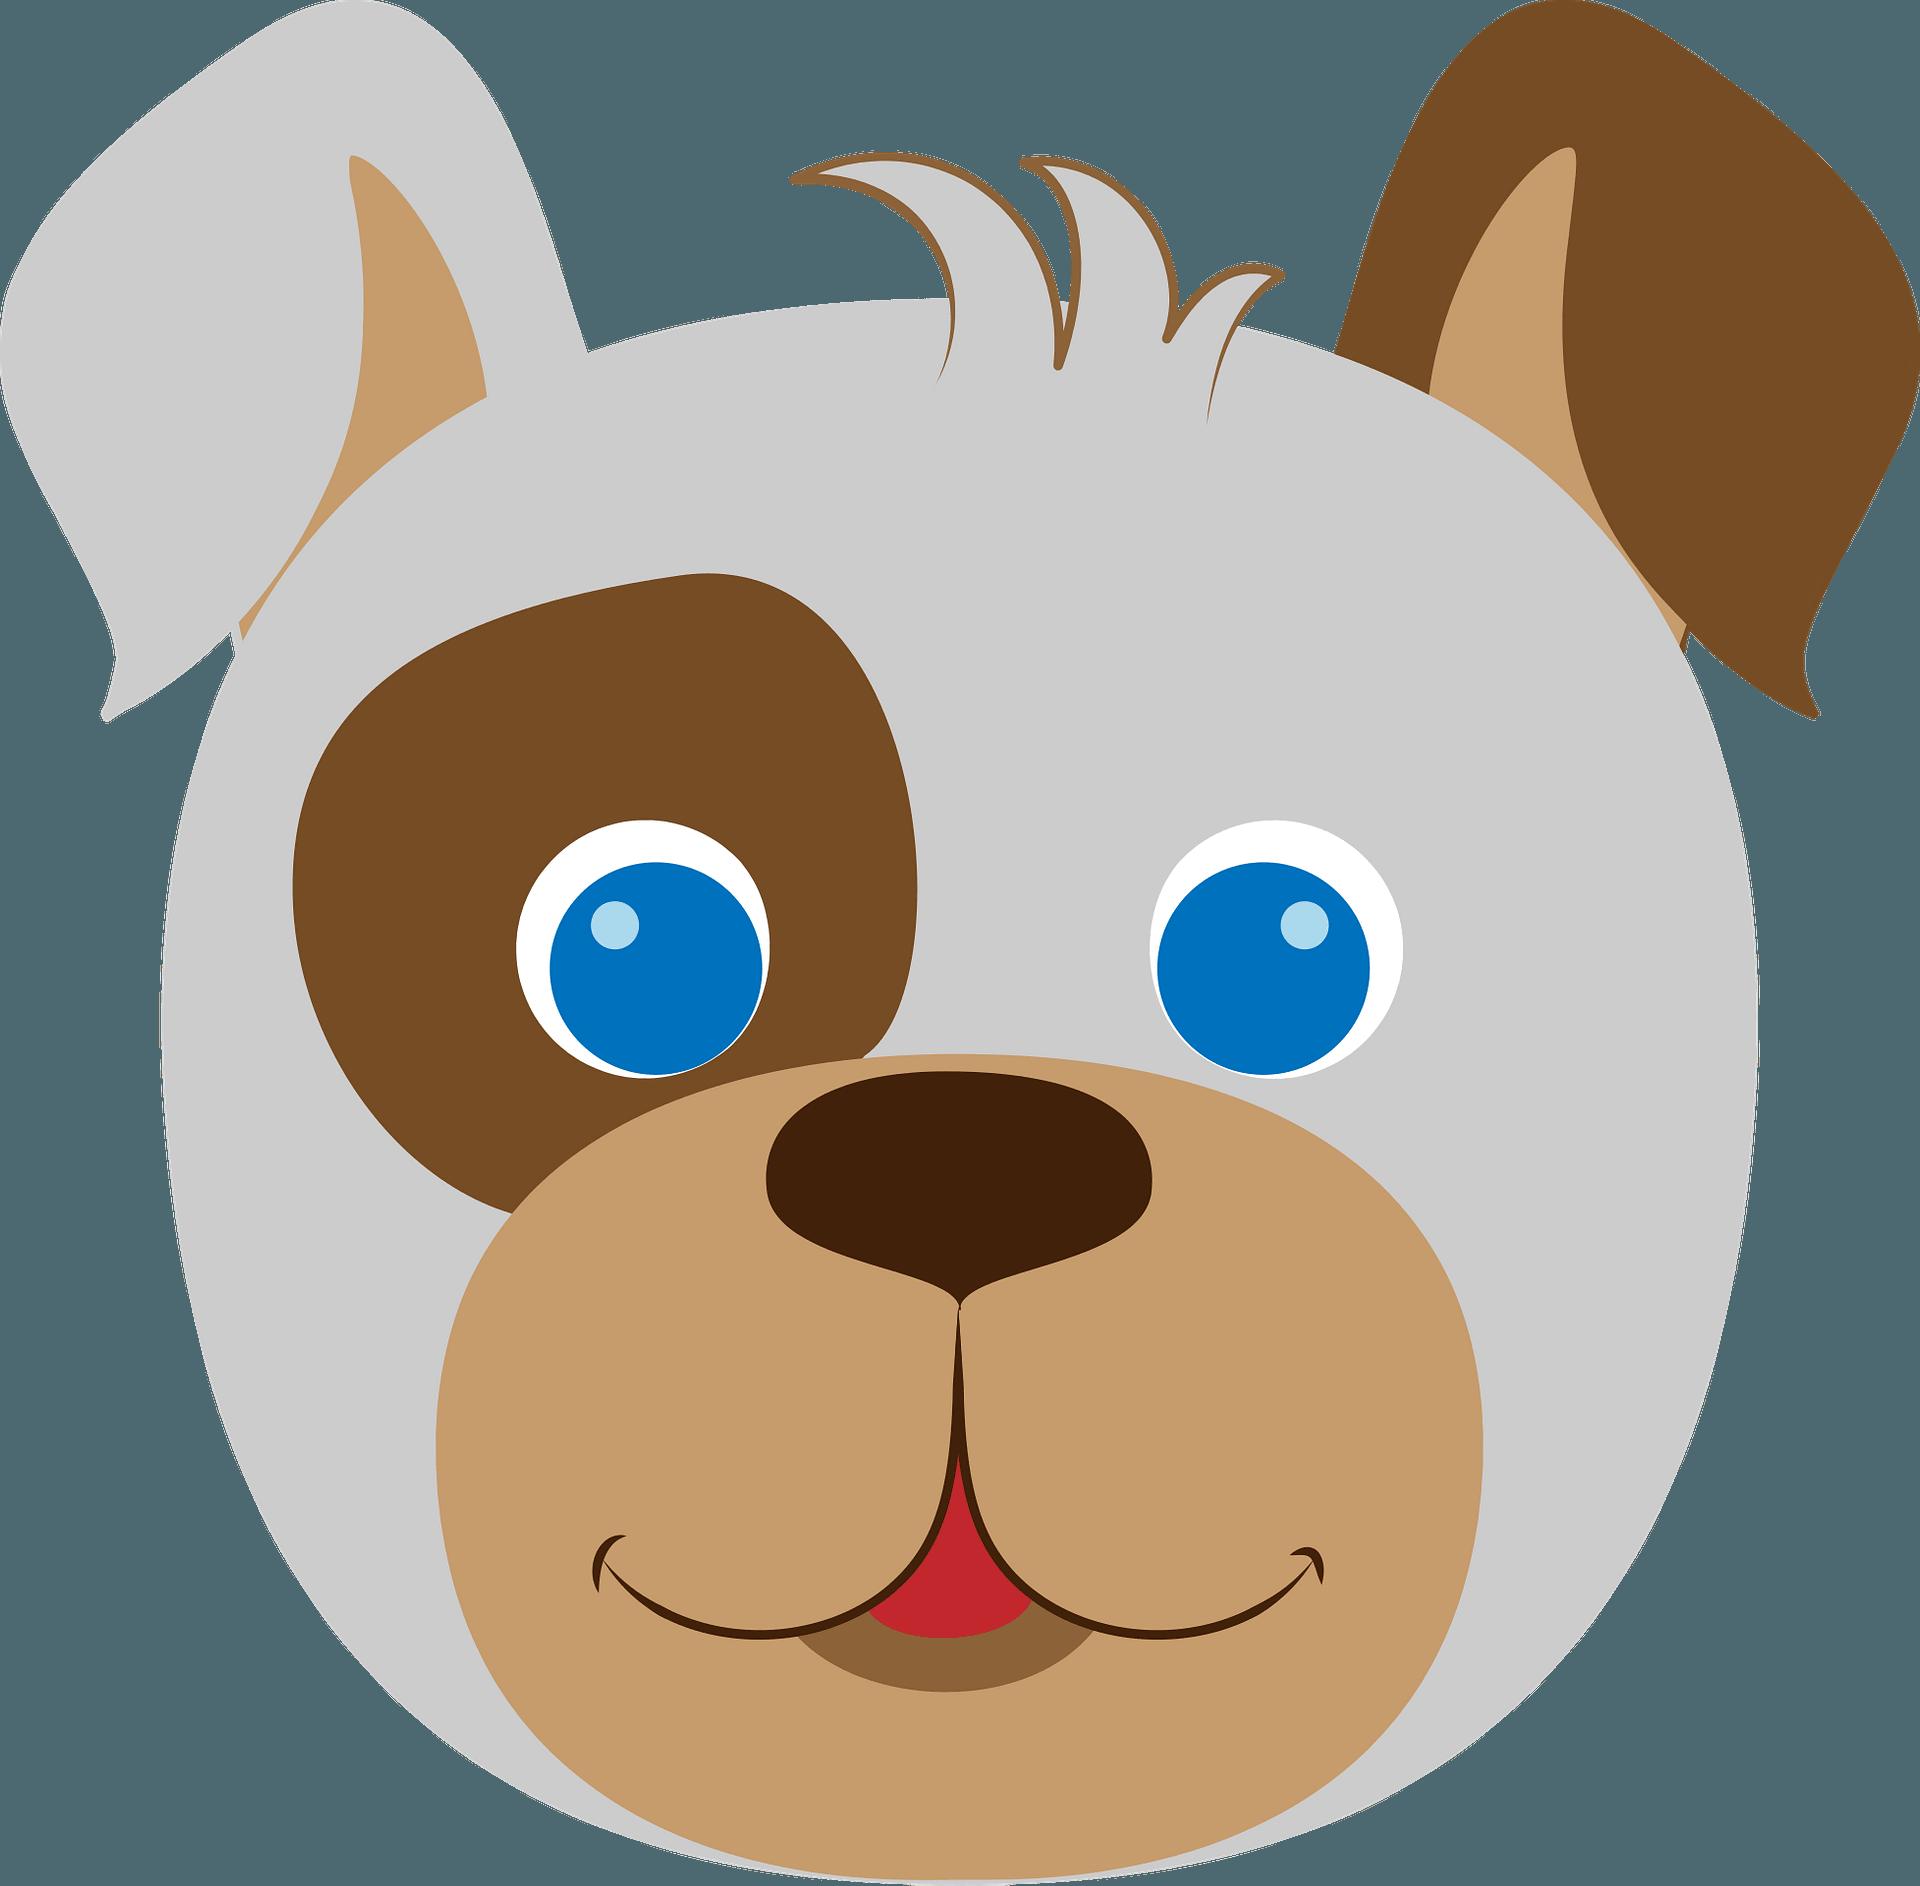 Dog Face Clipart Free Download Transparent Png Creazilla